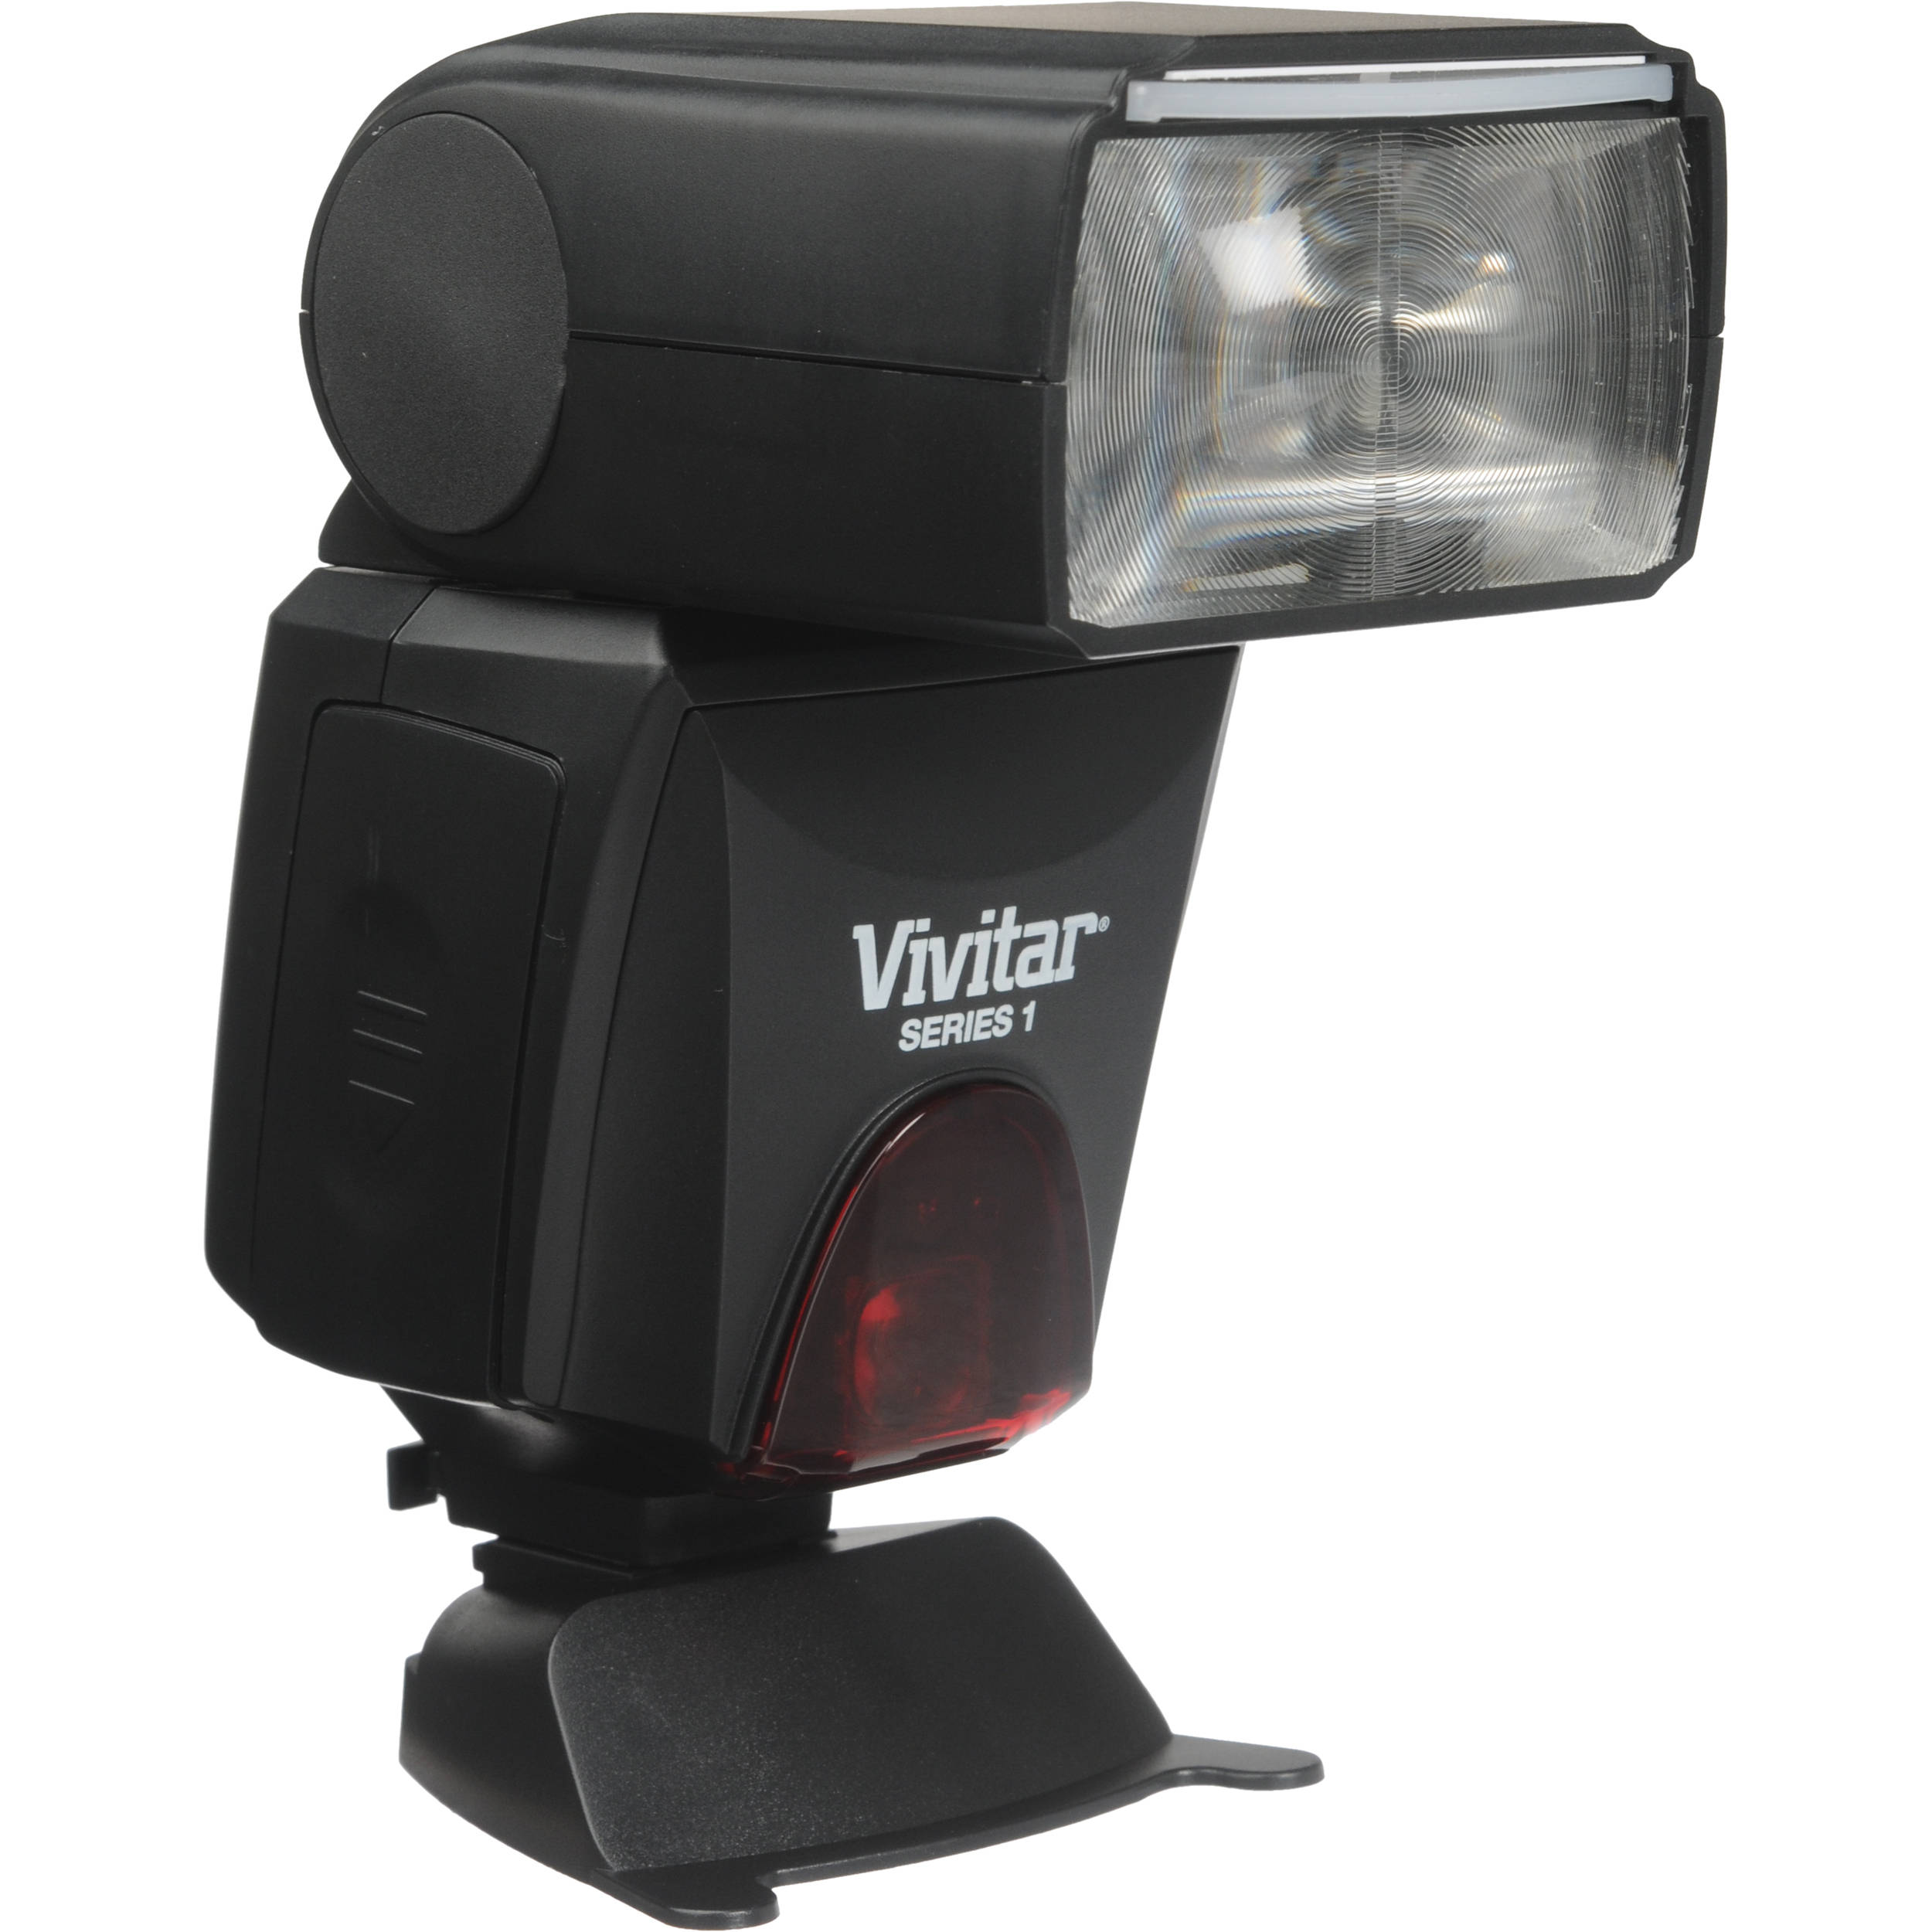 vivitar df 483 wireless ttl lcd flash for canon cameras df483can rh bhphotovideo com Clip Art User Guide Example User Guide